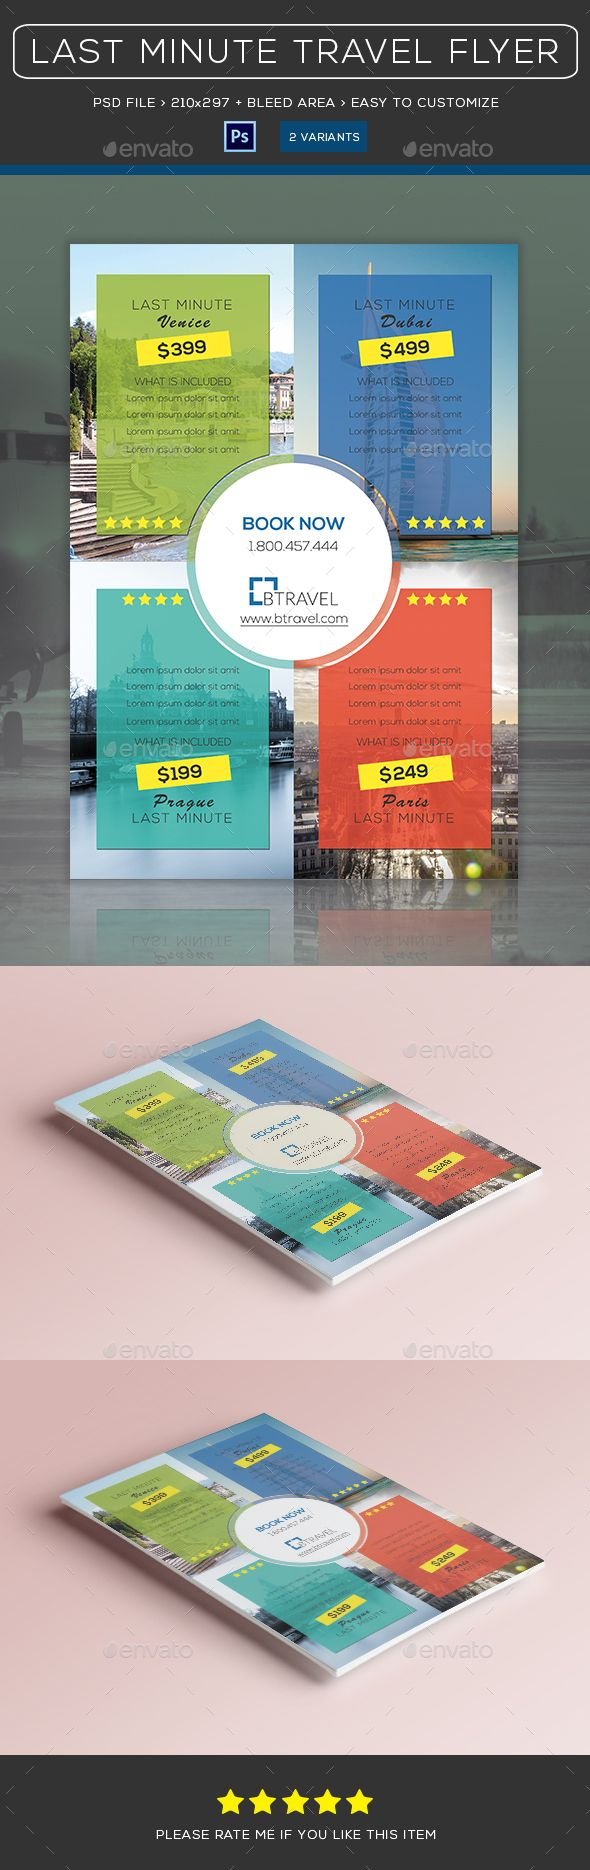 Travel | Last Minute | Flyer vol01